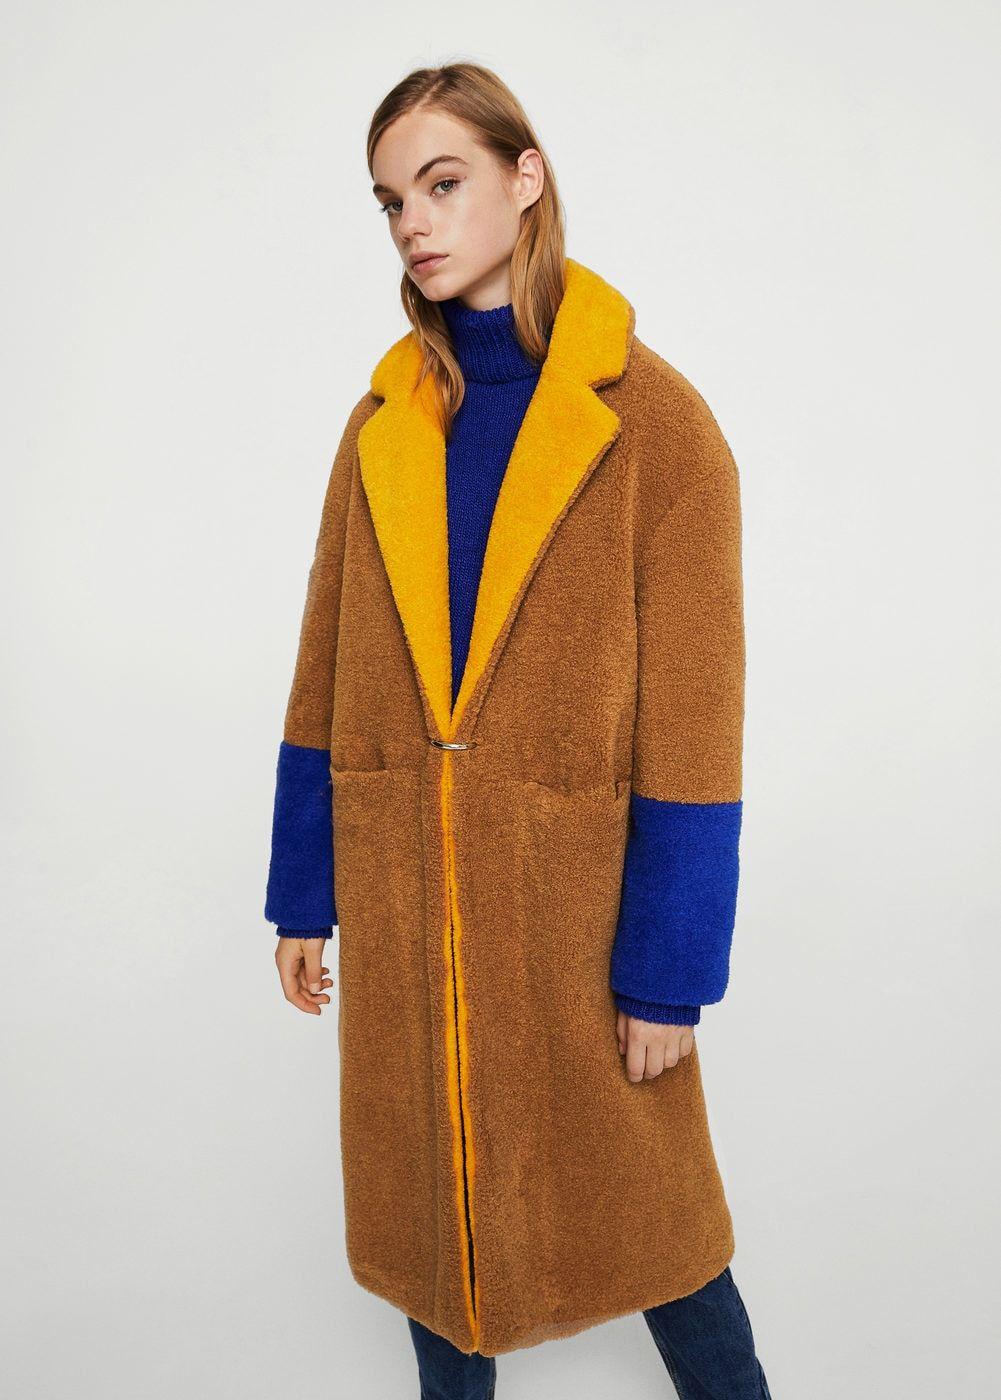 Faux Coats Fur WomanFashionMango Coat Contrast Nv0Owm8n